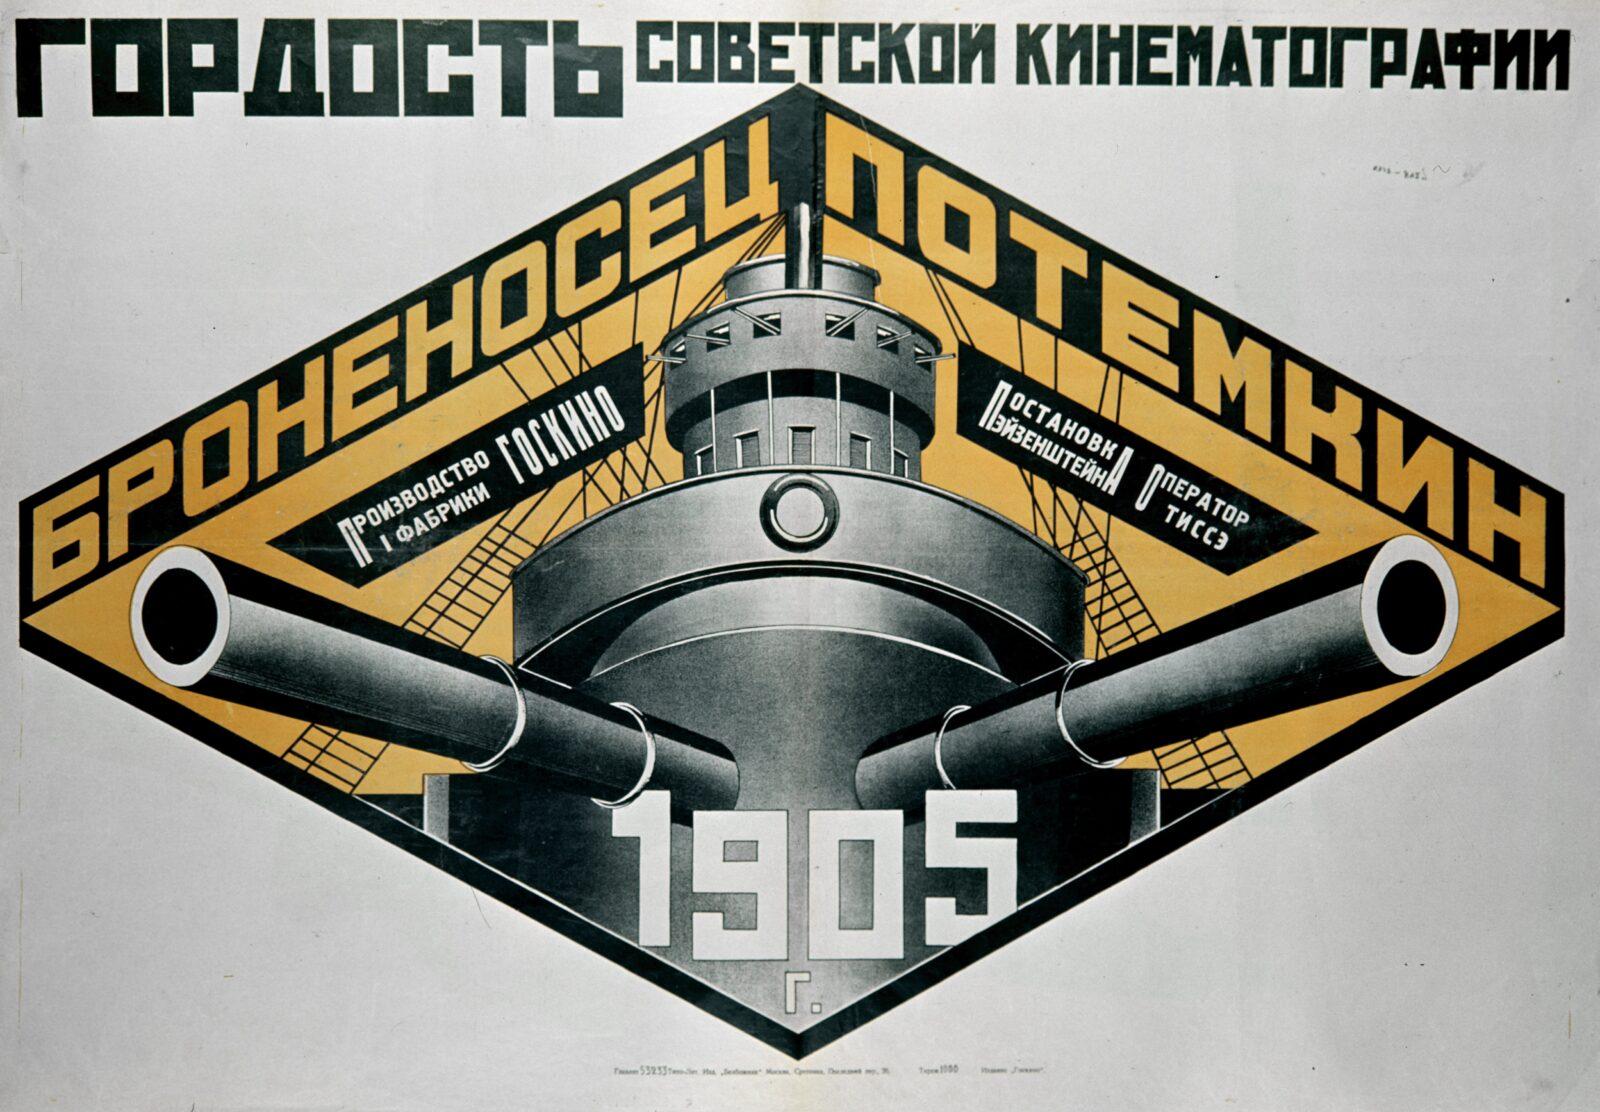 The Shot Of Revolution: Sergei Eisenstein, Who Turned Cinematograph Into Art